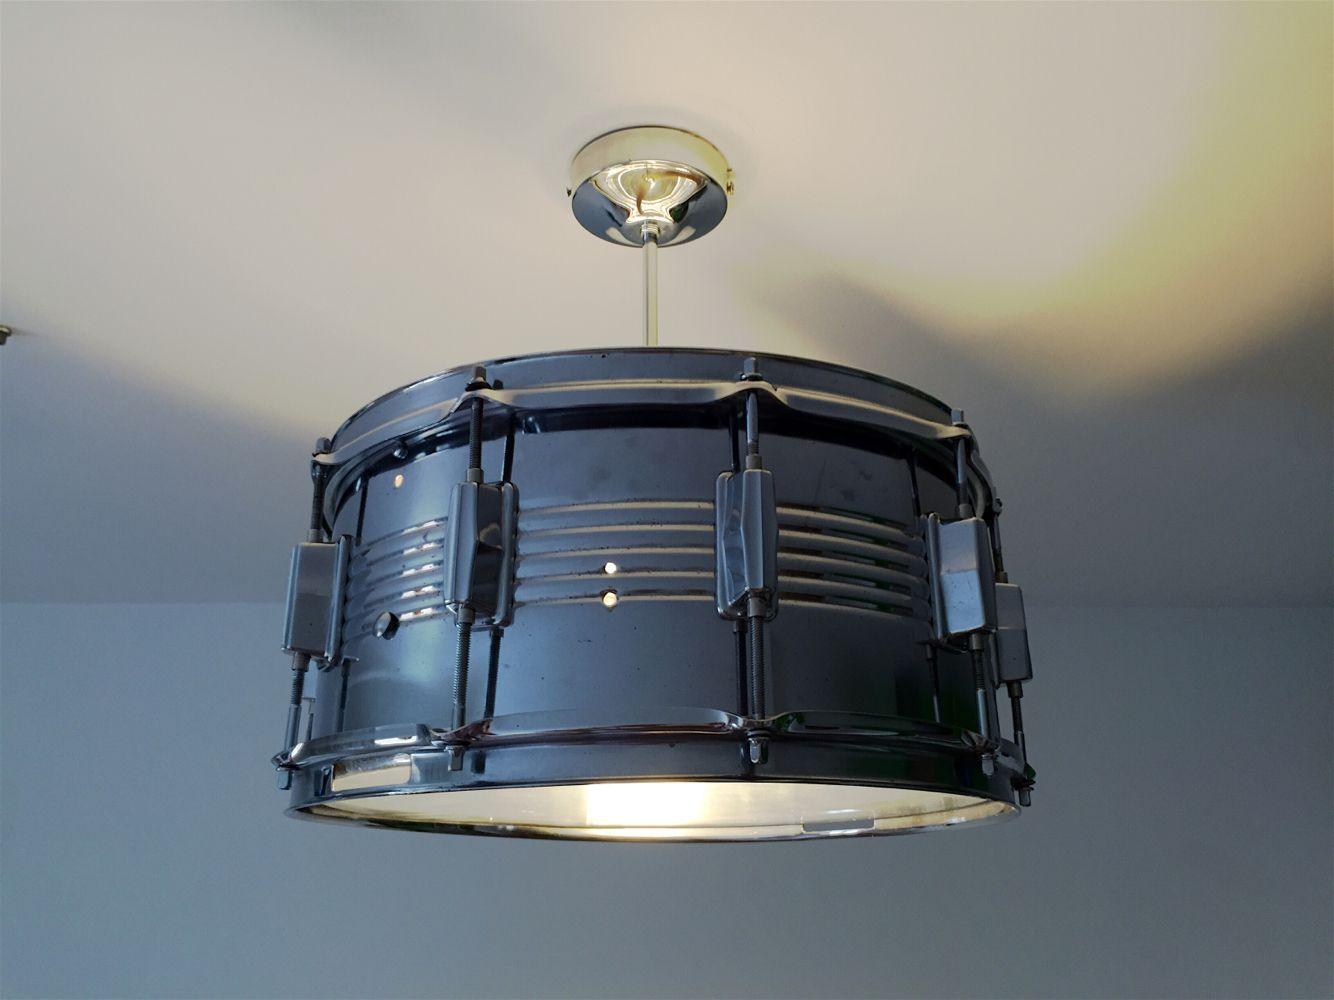 vintage snare drum ceiling light repurpose ceiling lights lighting ceiling. Black Bedroom Furniture Sets. Home Design Ideas